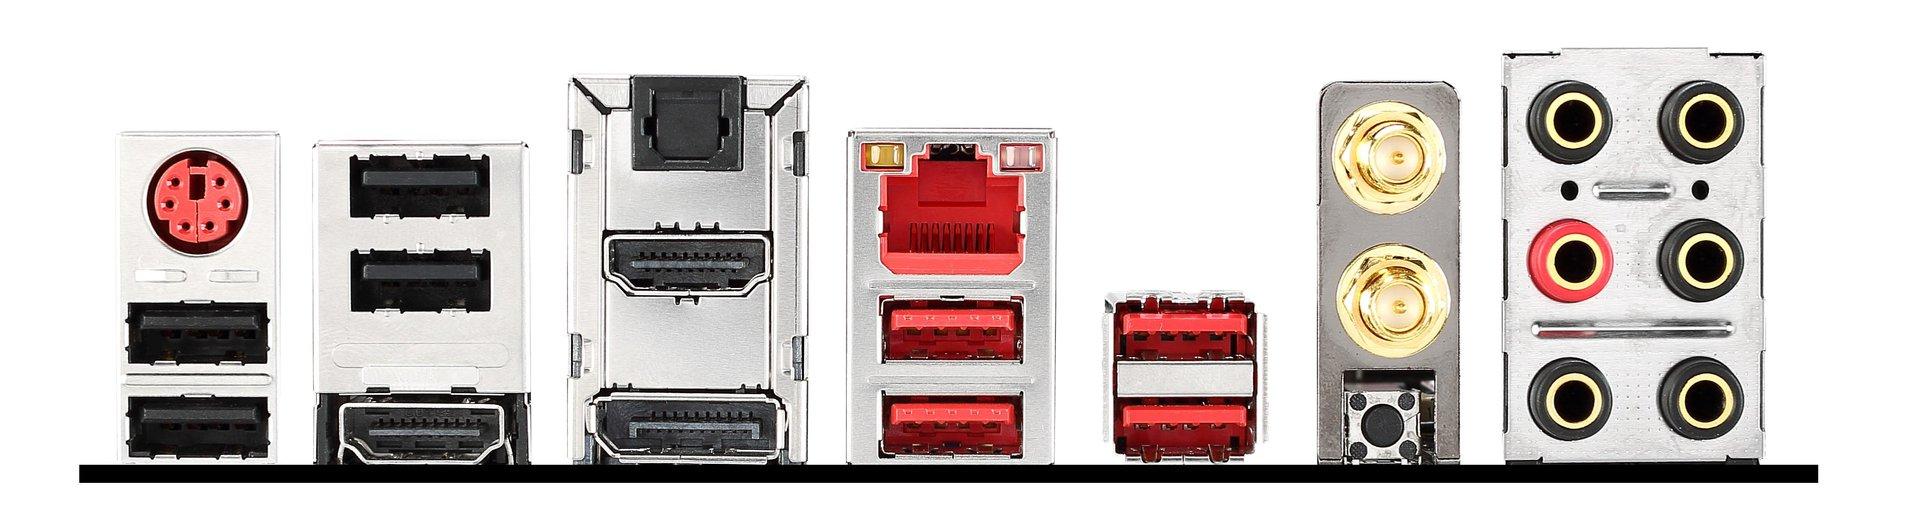 MSI Z97I Gaming ACK – das I/O-Panel mit Anschlüssen